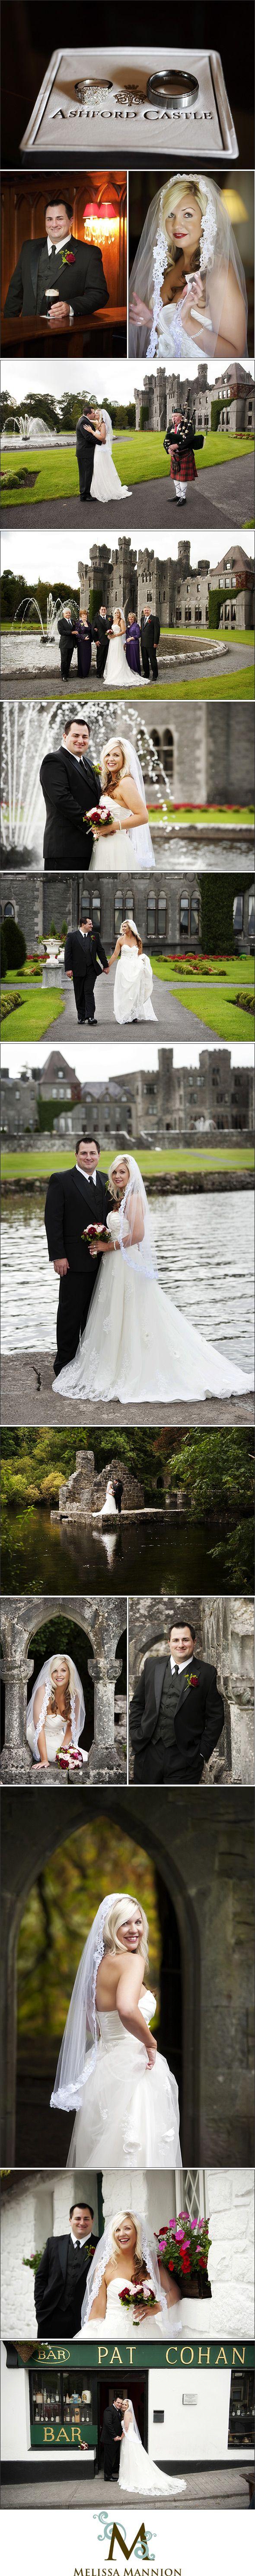 What a day! #AshfordCastle has everything covered for your dream #wedding... #ireland #destinationwedding #bride